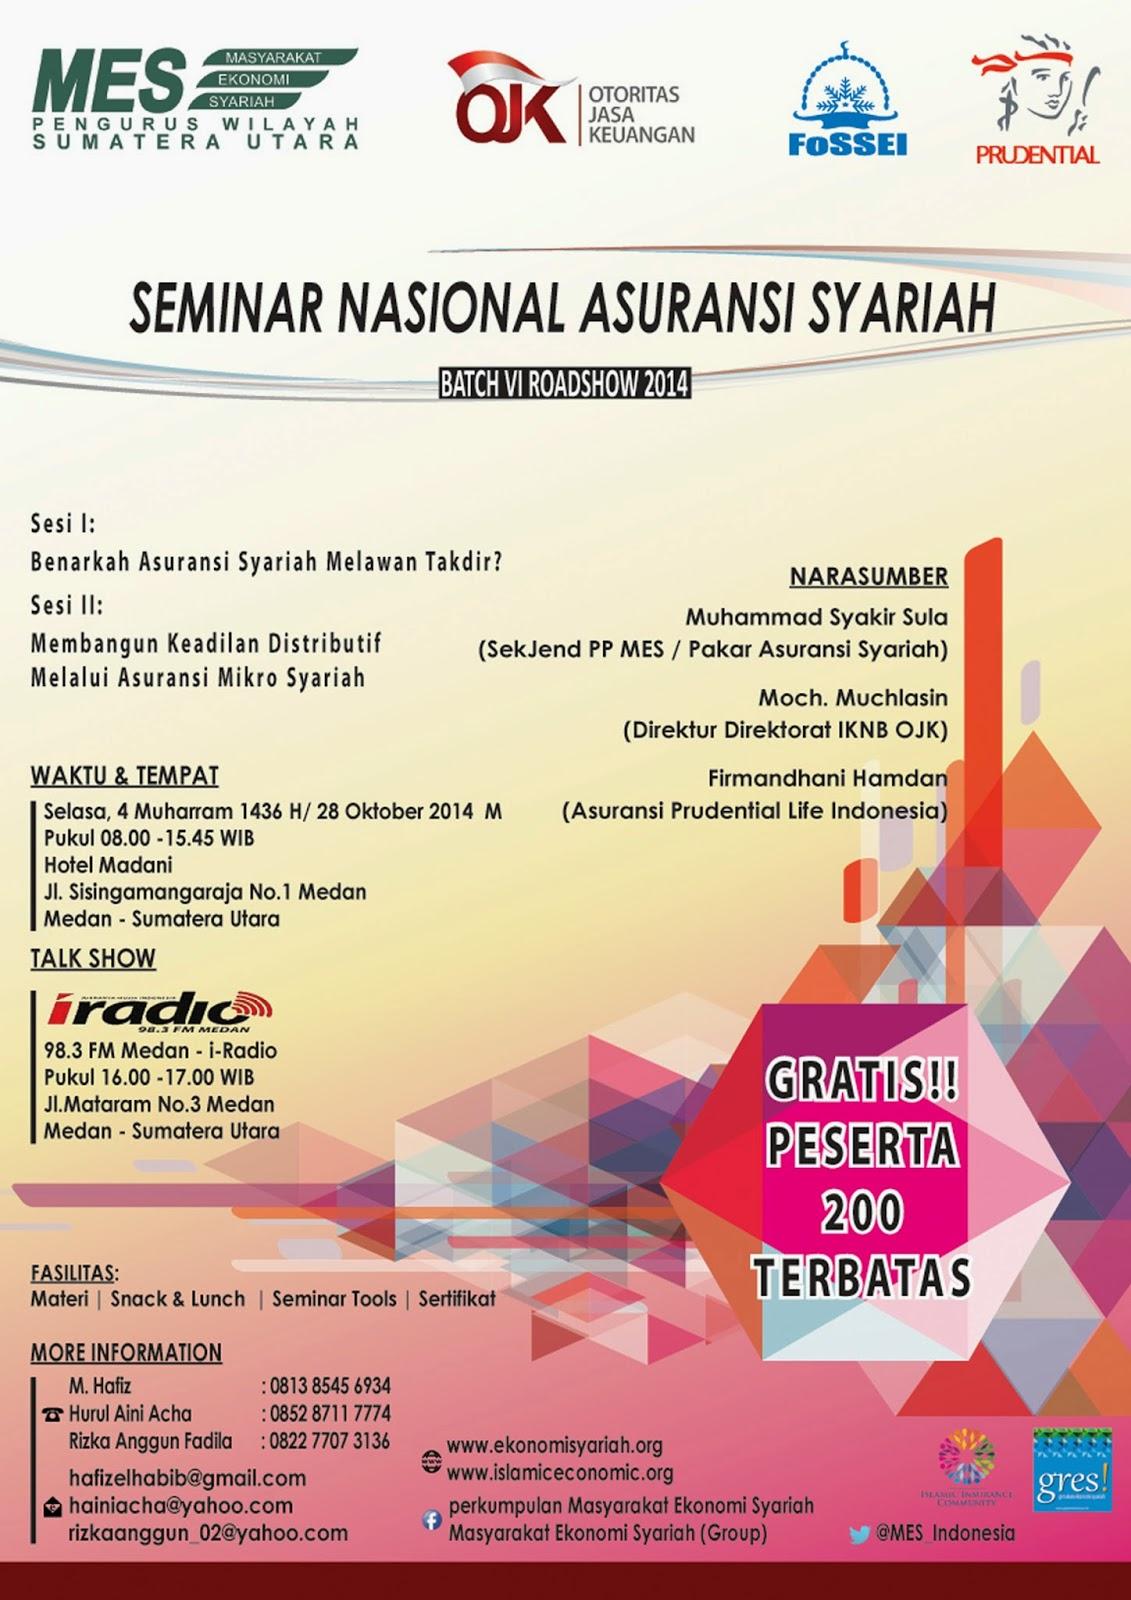 Roadshow Seminar Asuransi Syariah di Medan